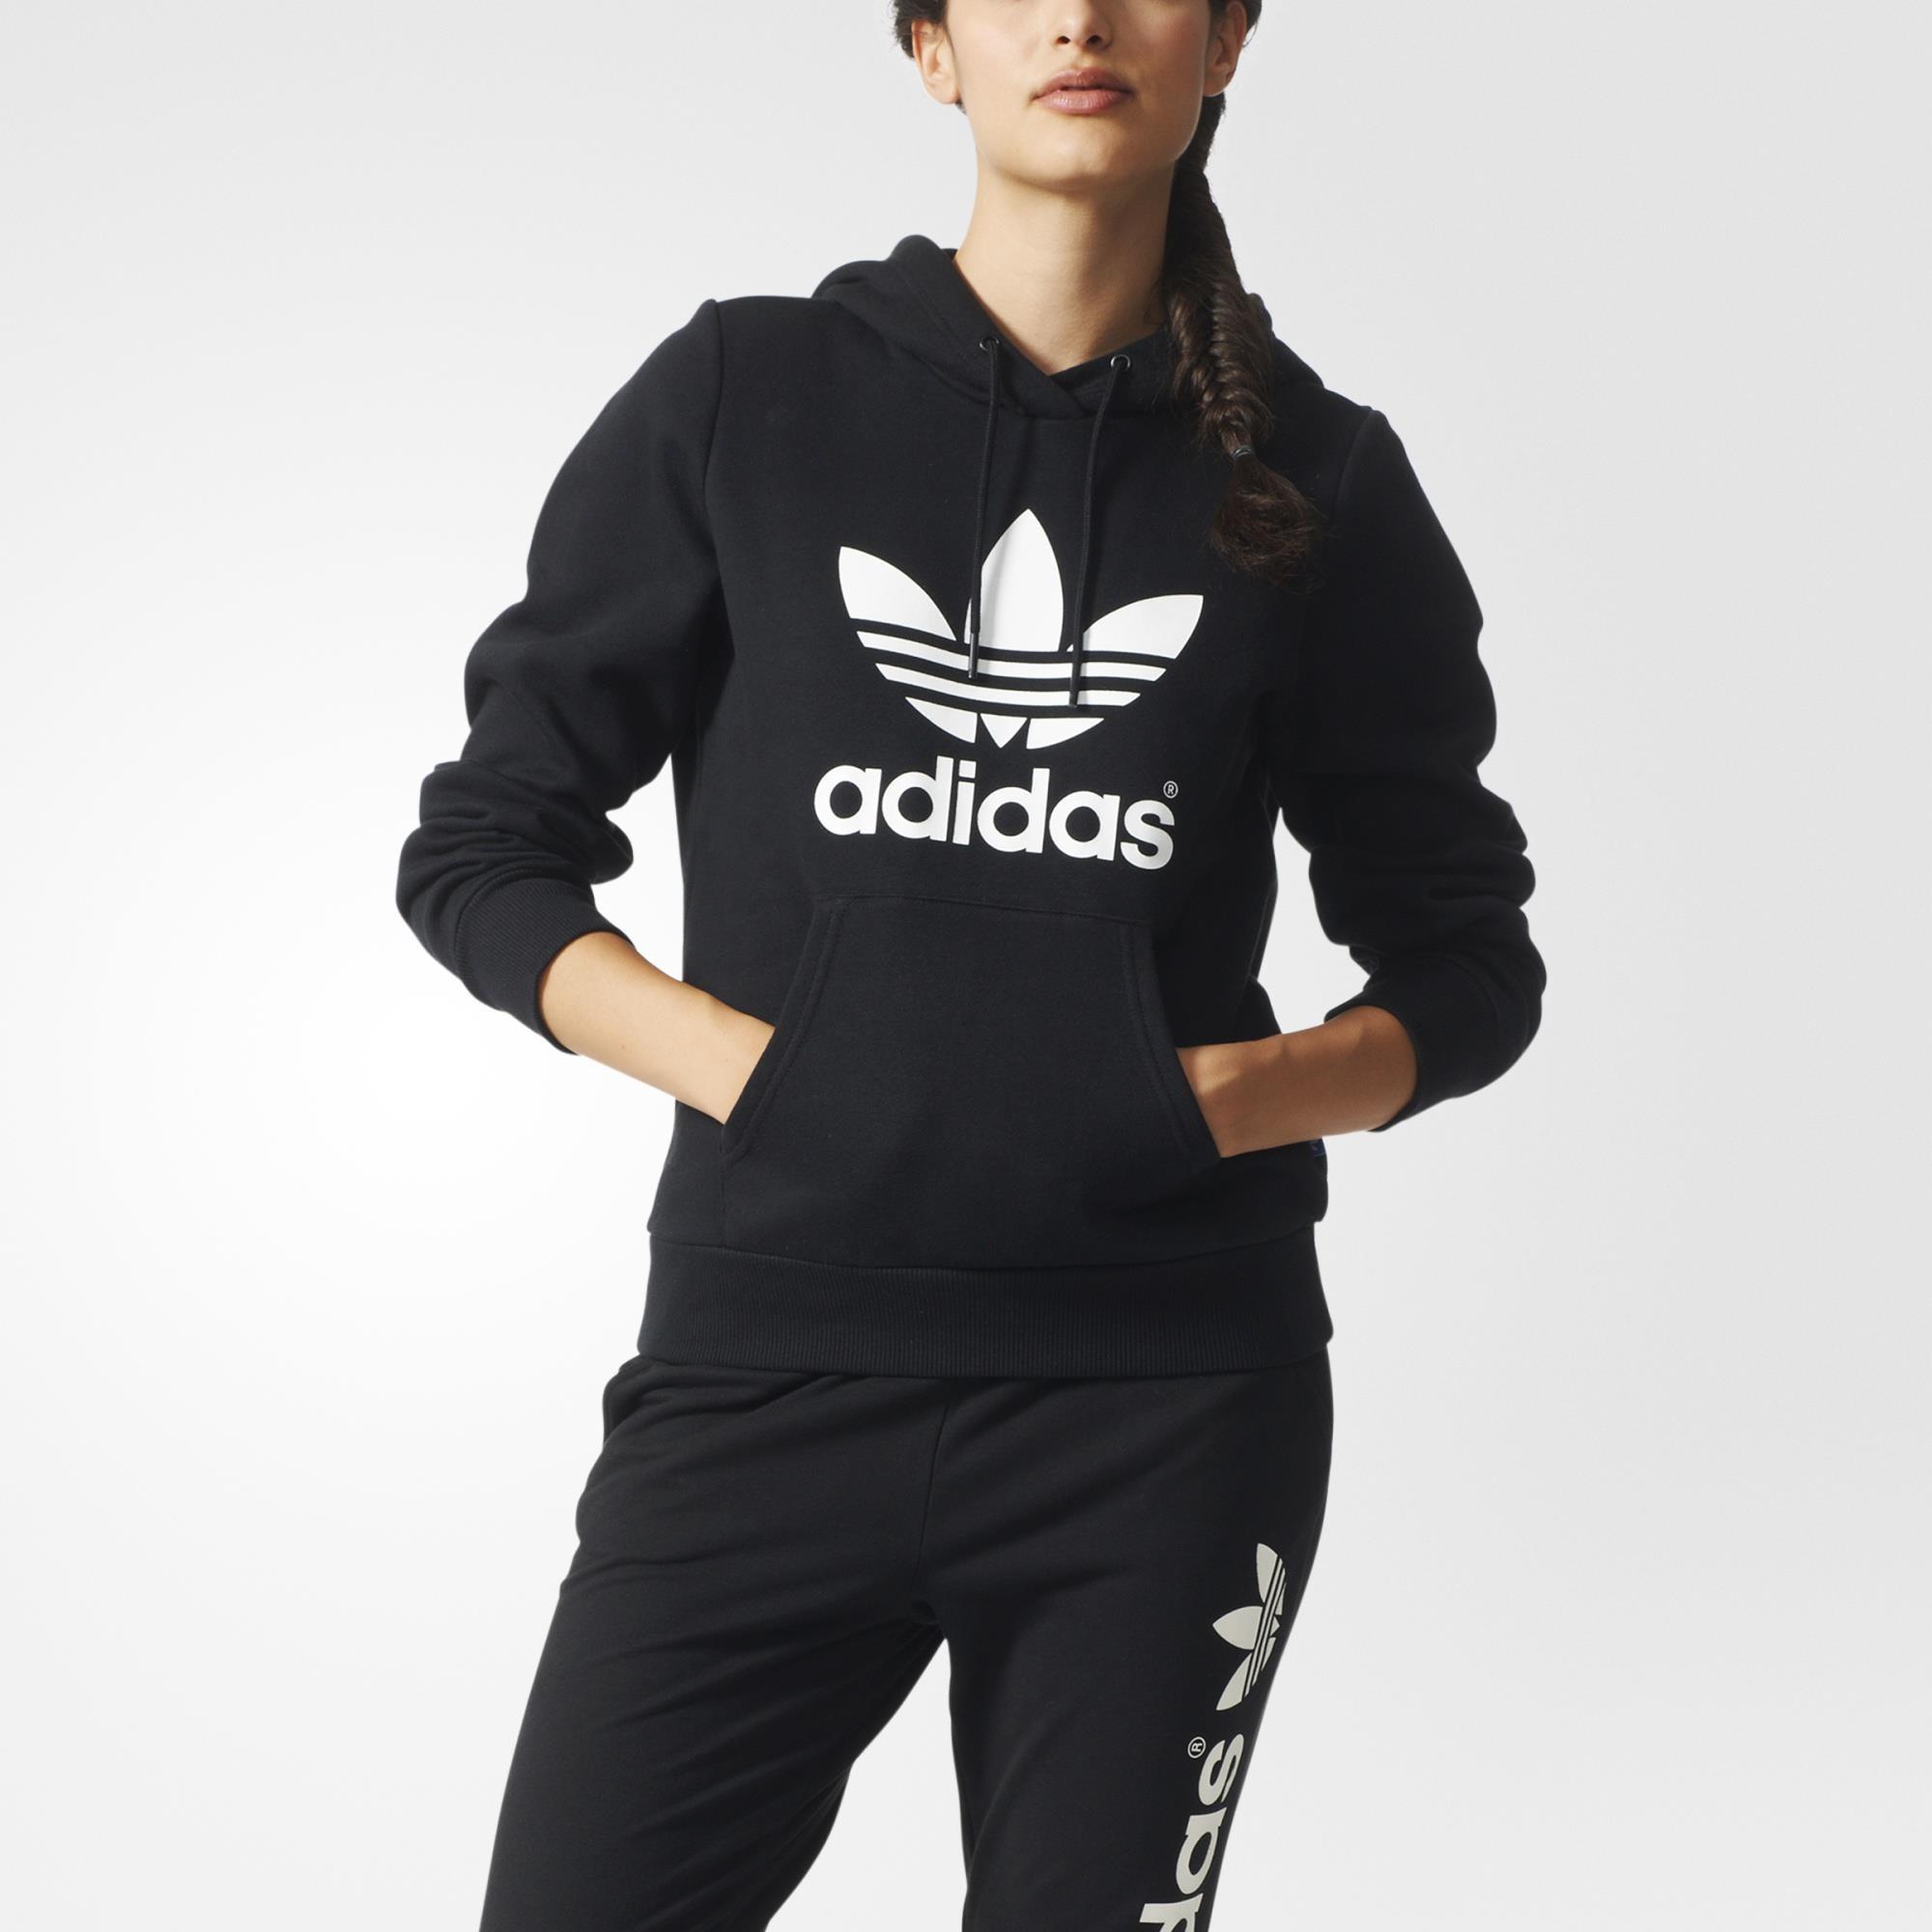 adidas originals trefoil hoodie. Black Bedroom Furniture Sets. Home Design Ideas